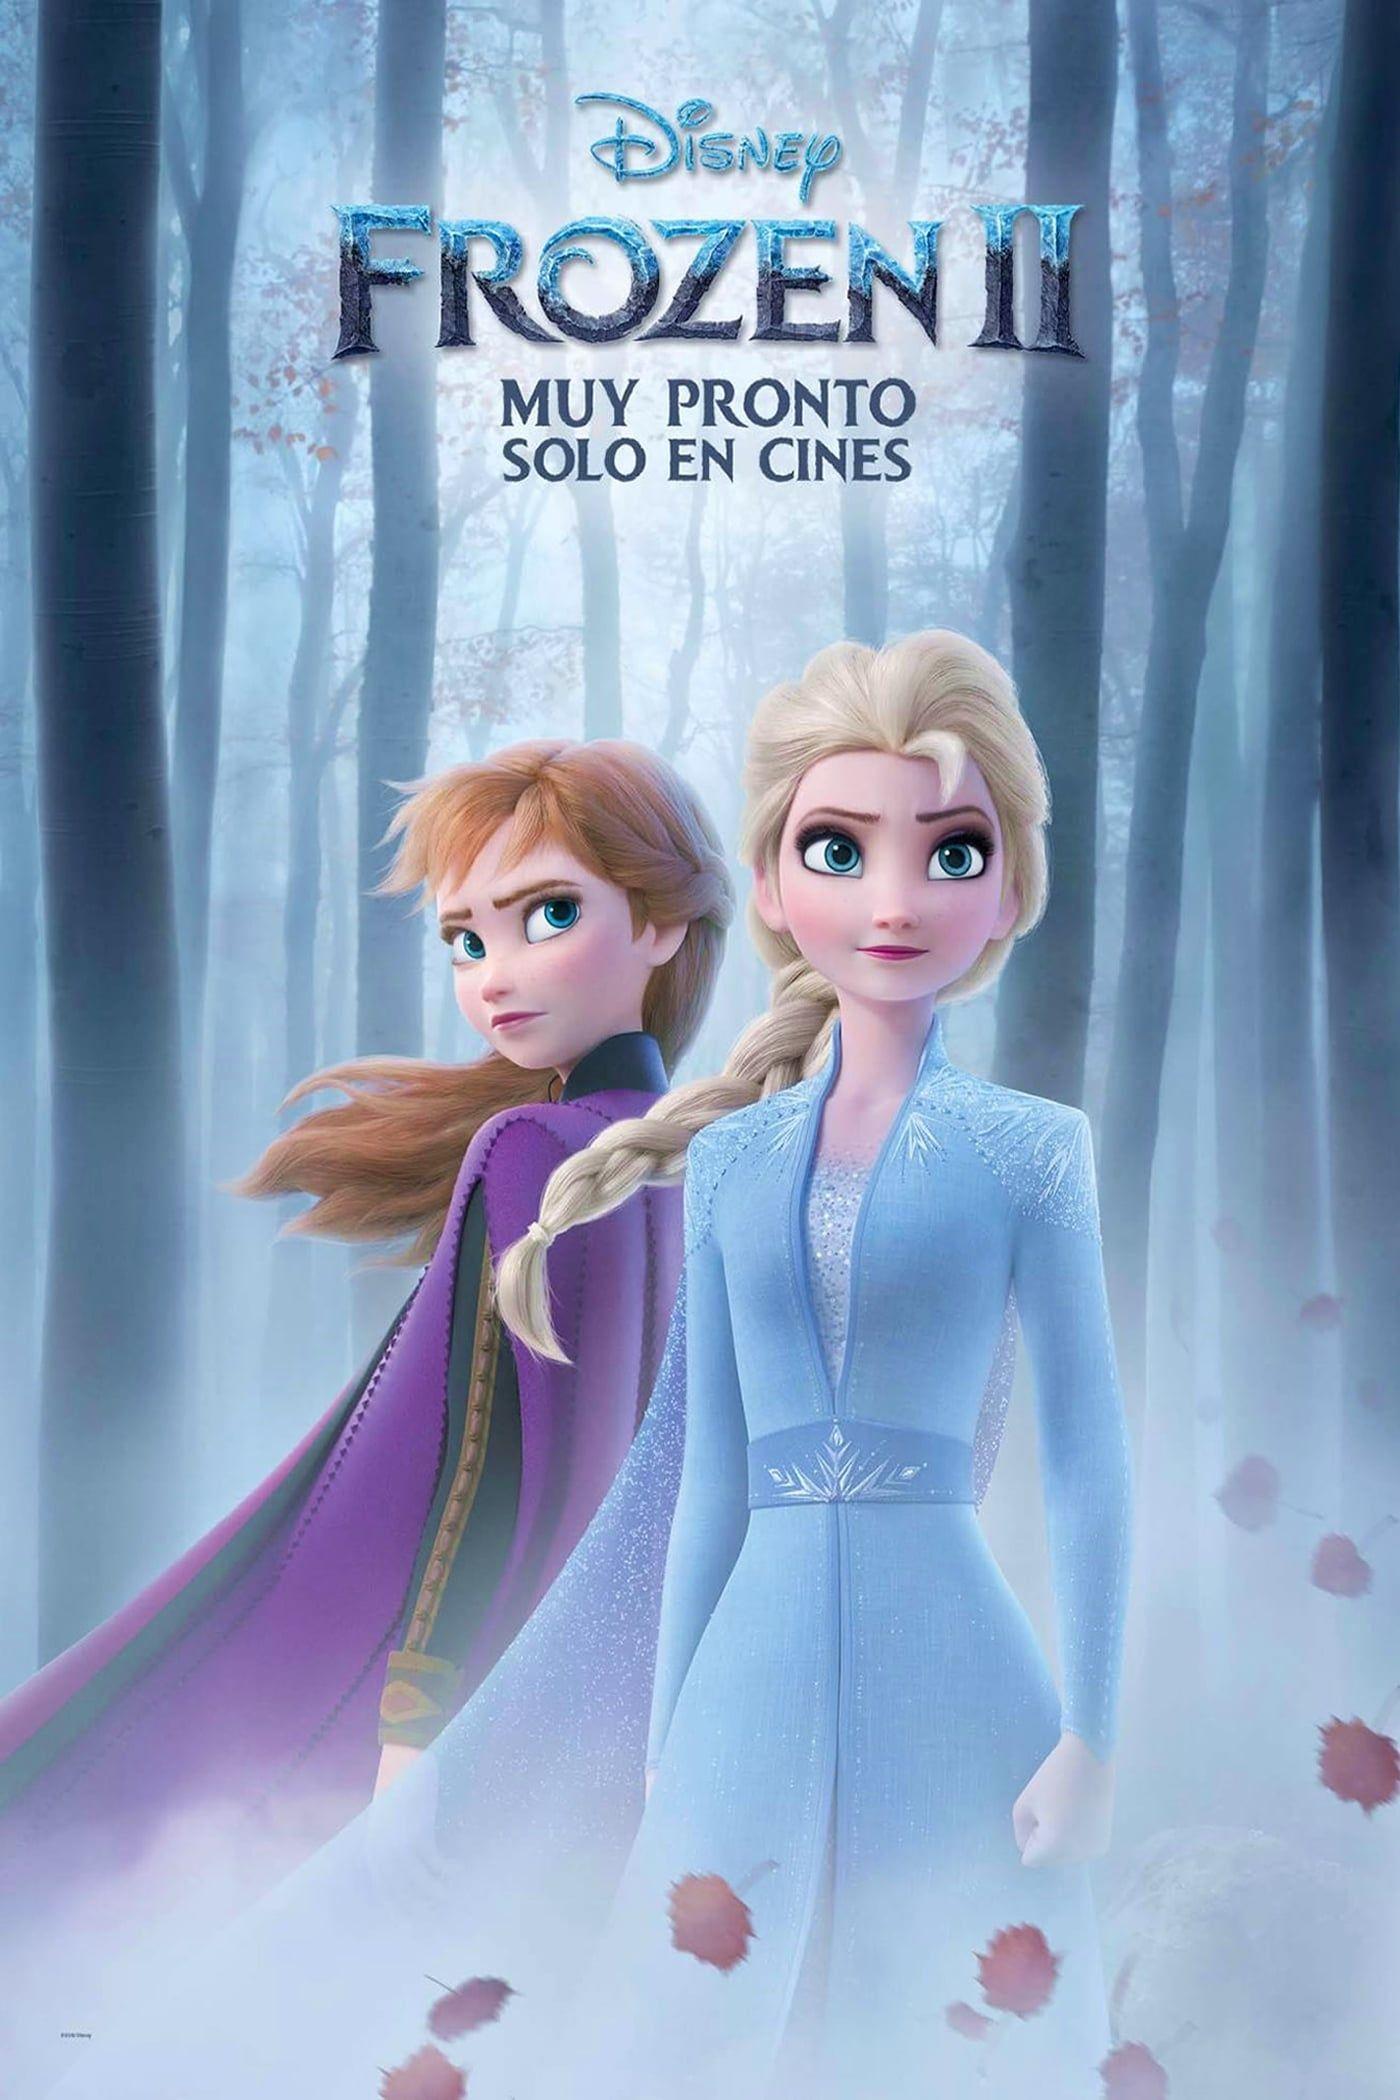 Watch Frozen Ii Full Movie 2019 Online Free Putlockers Frozenii Fullmovie Fu Free Movies Online Walt Disney Animation Walt Disney Animation Studios